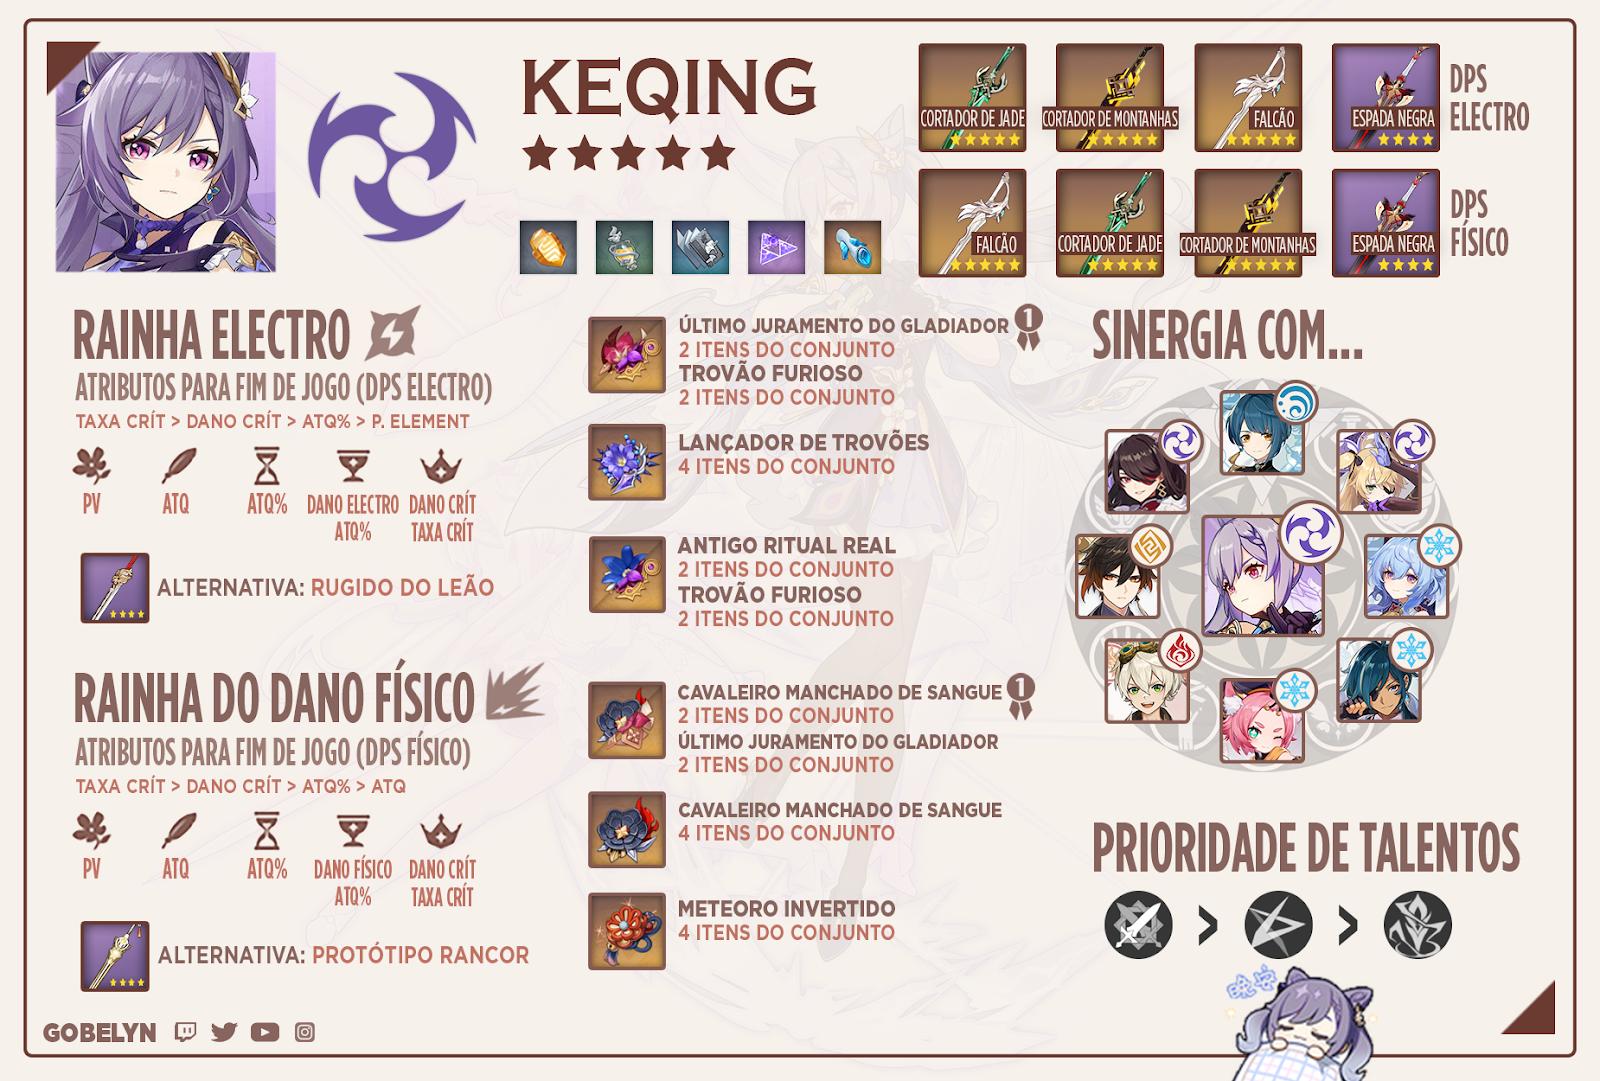 keqing genshin impact gobelyn portugues